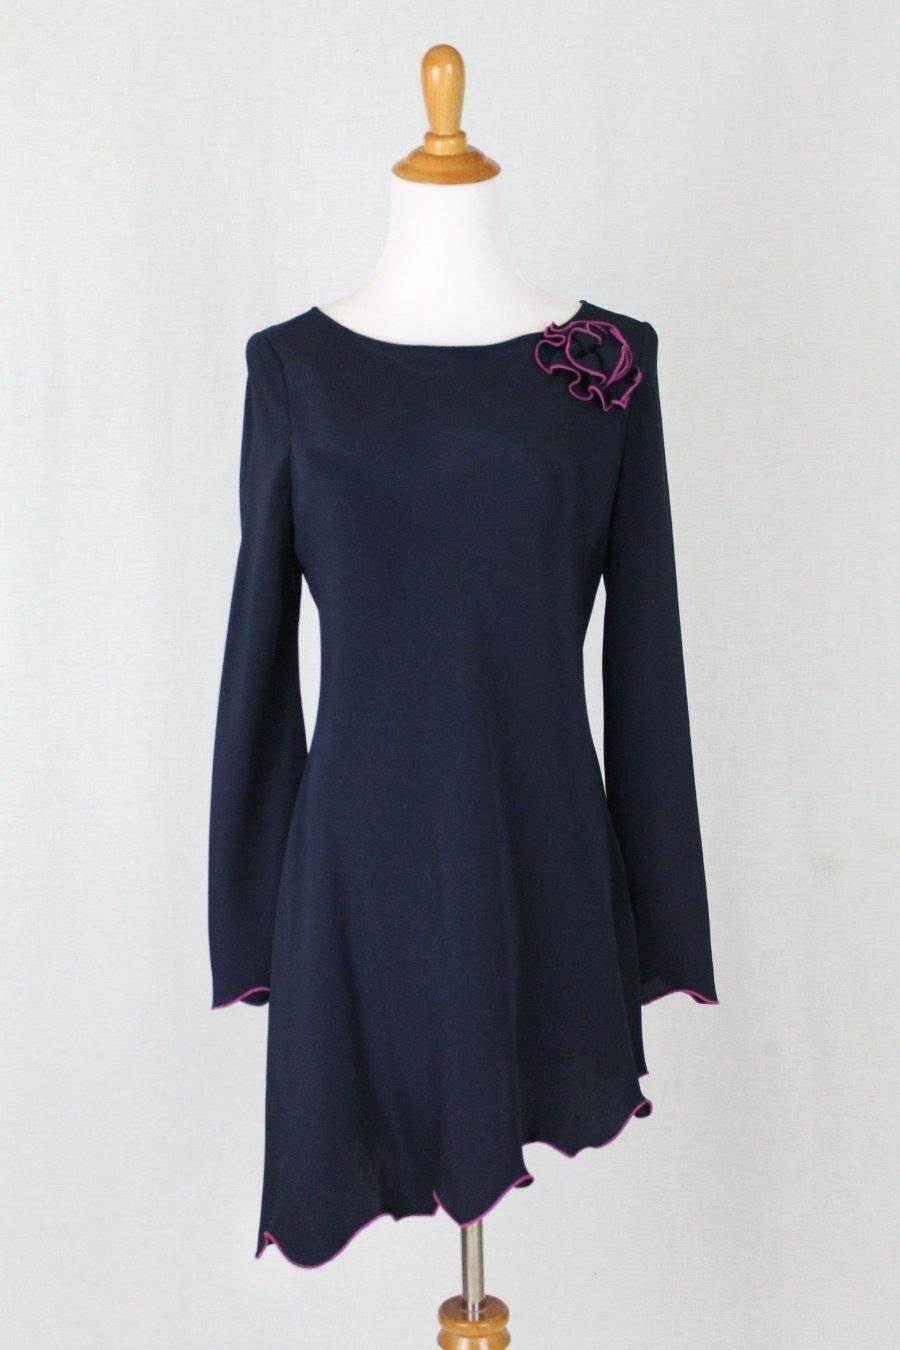 Vintage Holly Harp Navy Blue Silk Jersey Asymmetrical Hem Tunic Top or Dress S